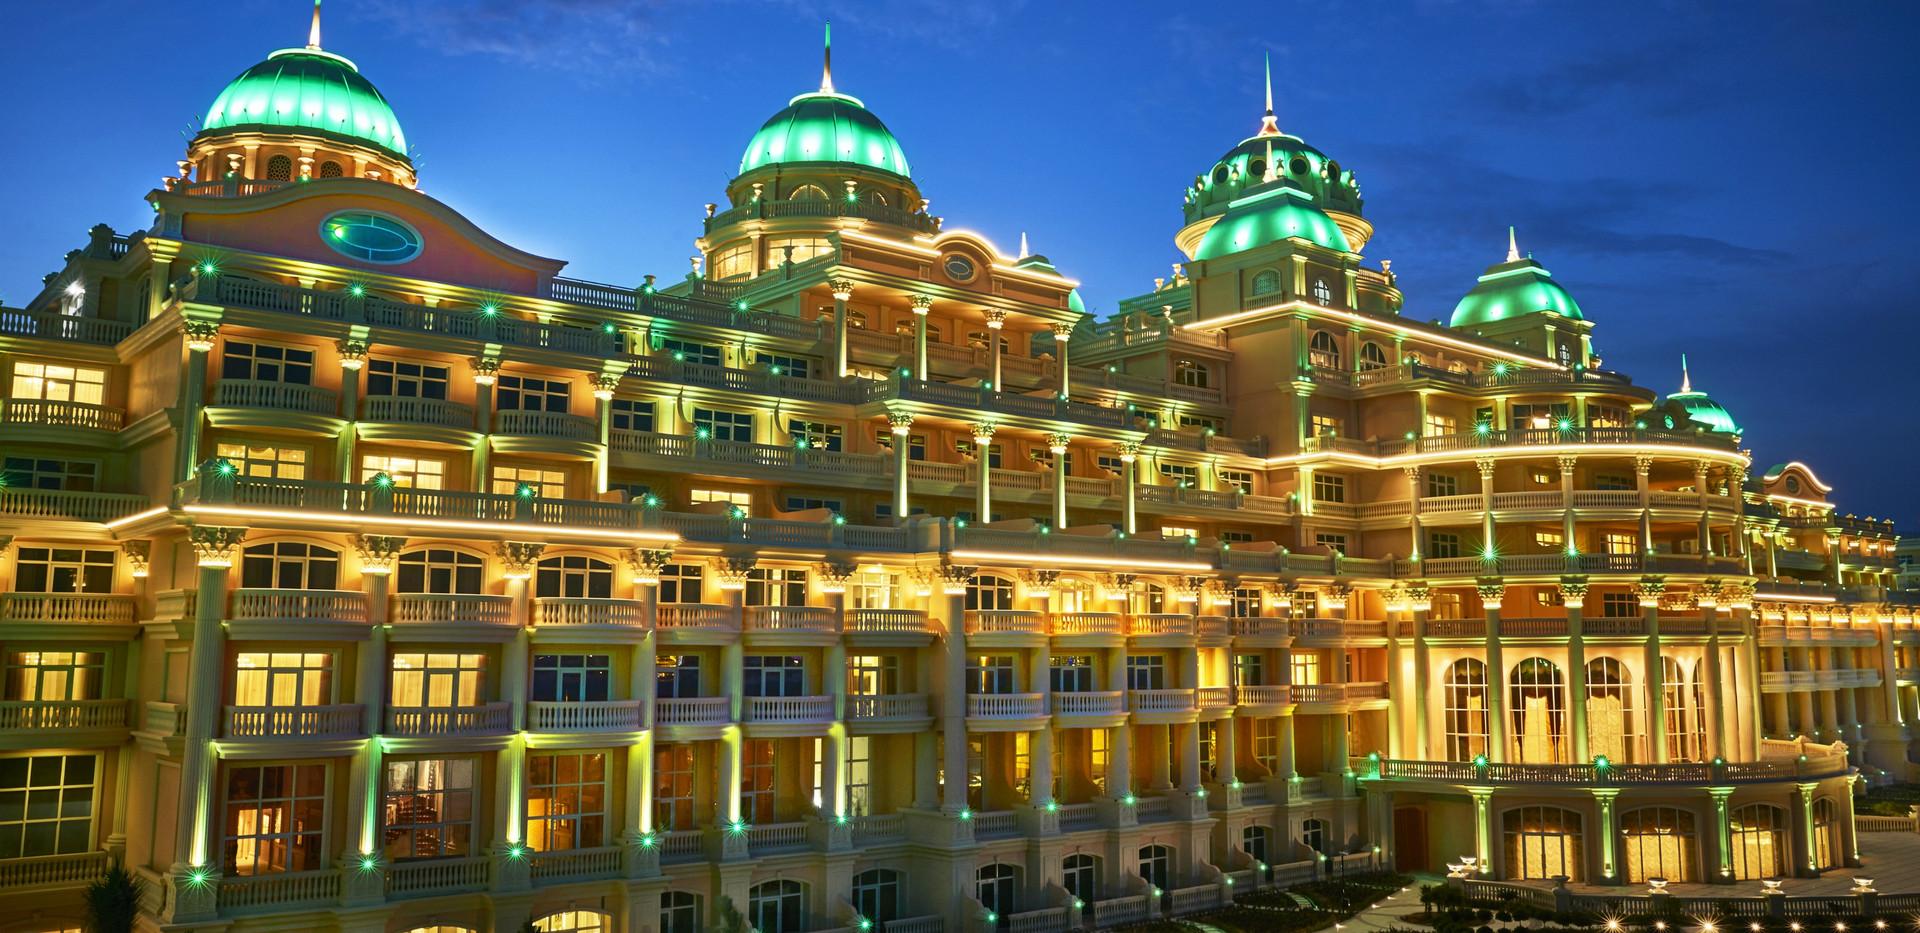 Emerald Palace Kempinski Dubai - Exterio